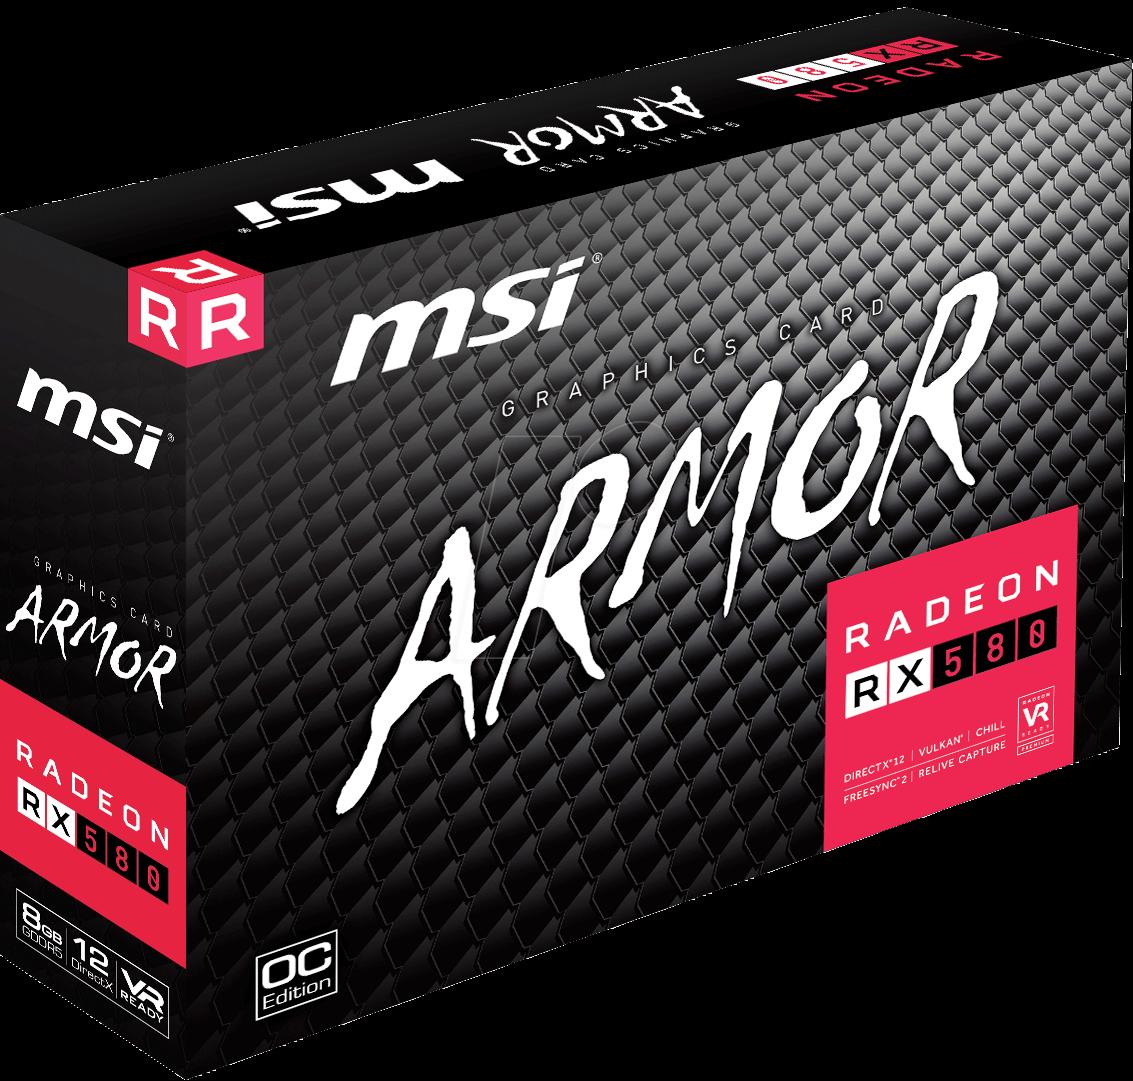 MSI V341-064R - MSI Radeon RX 580 Armor - 8GB